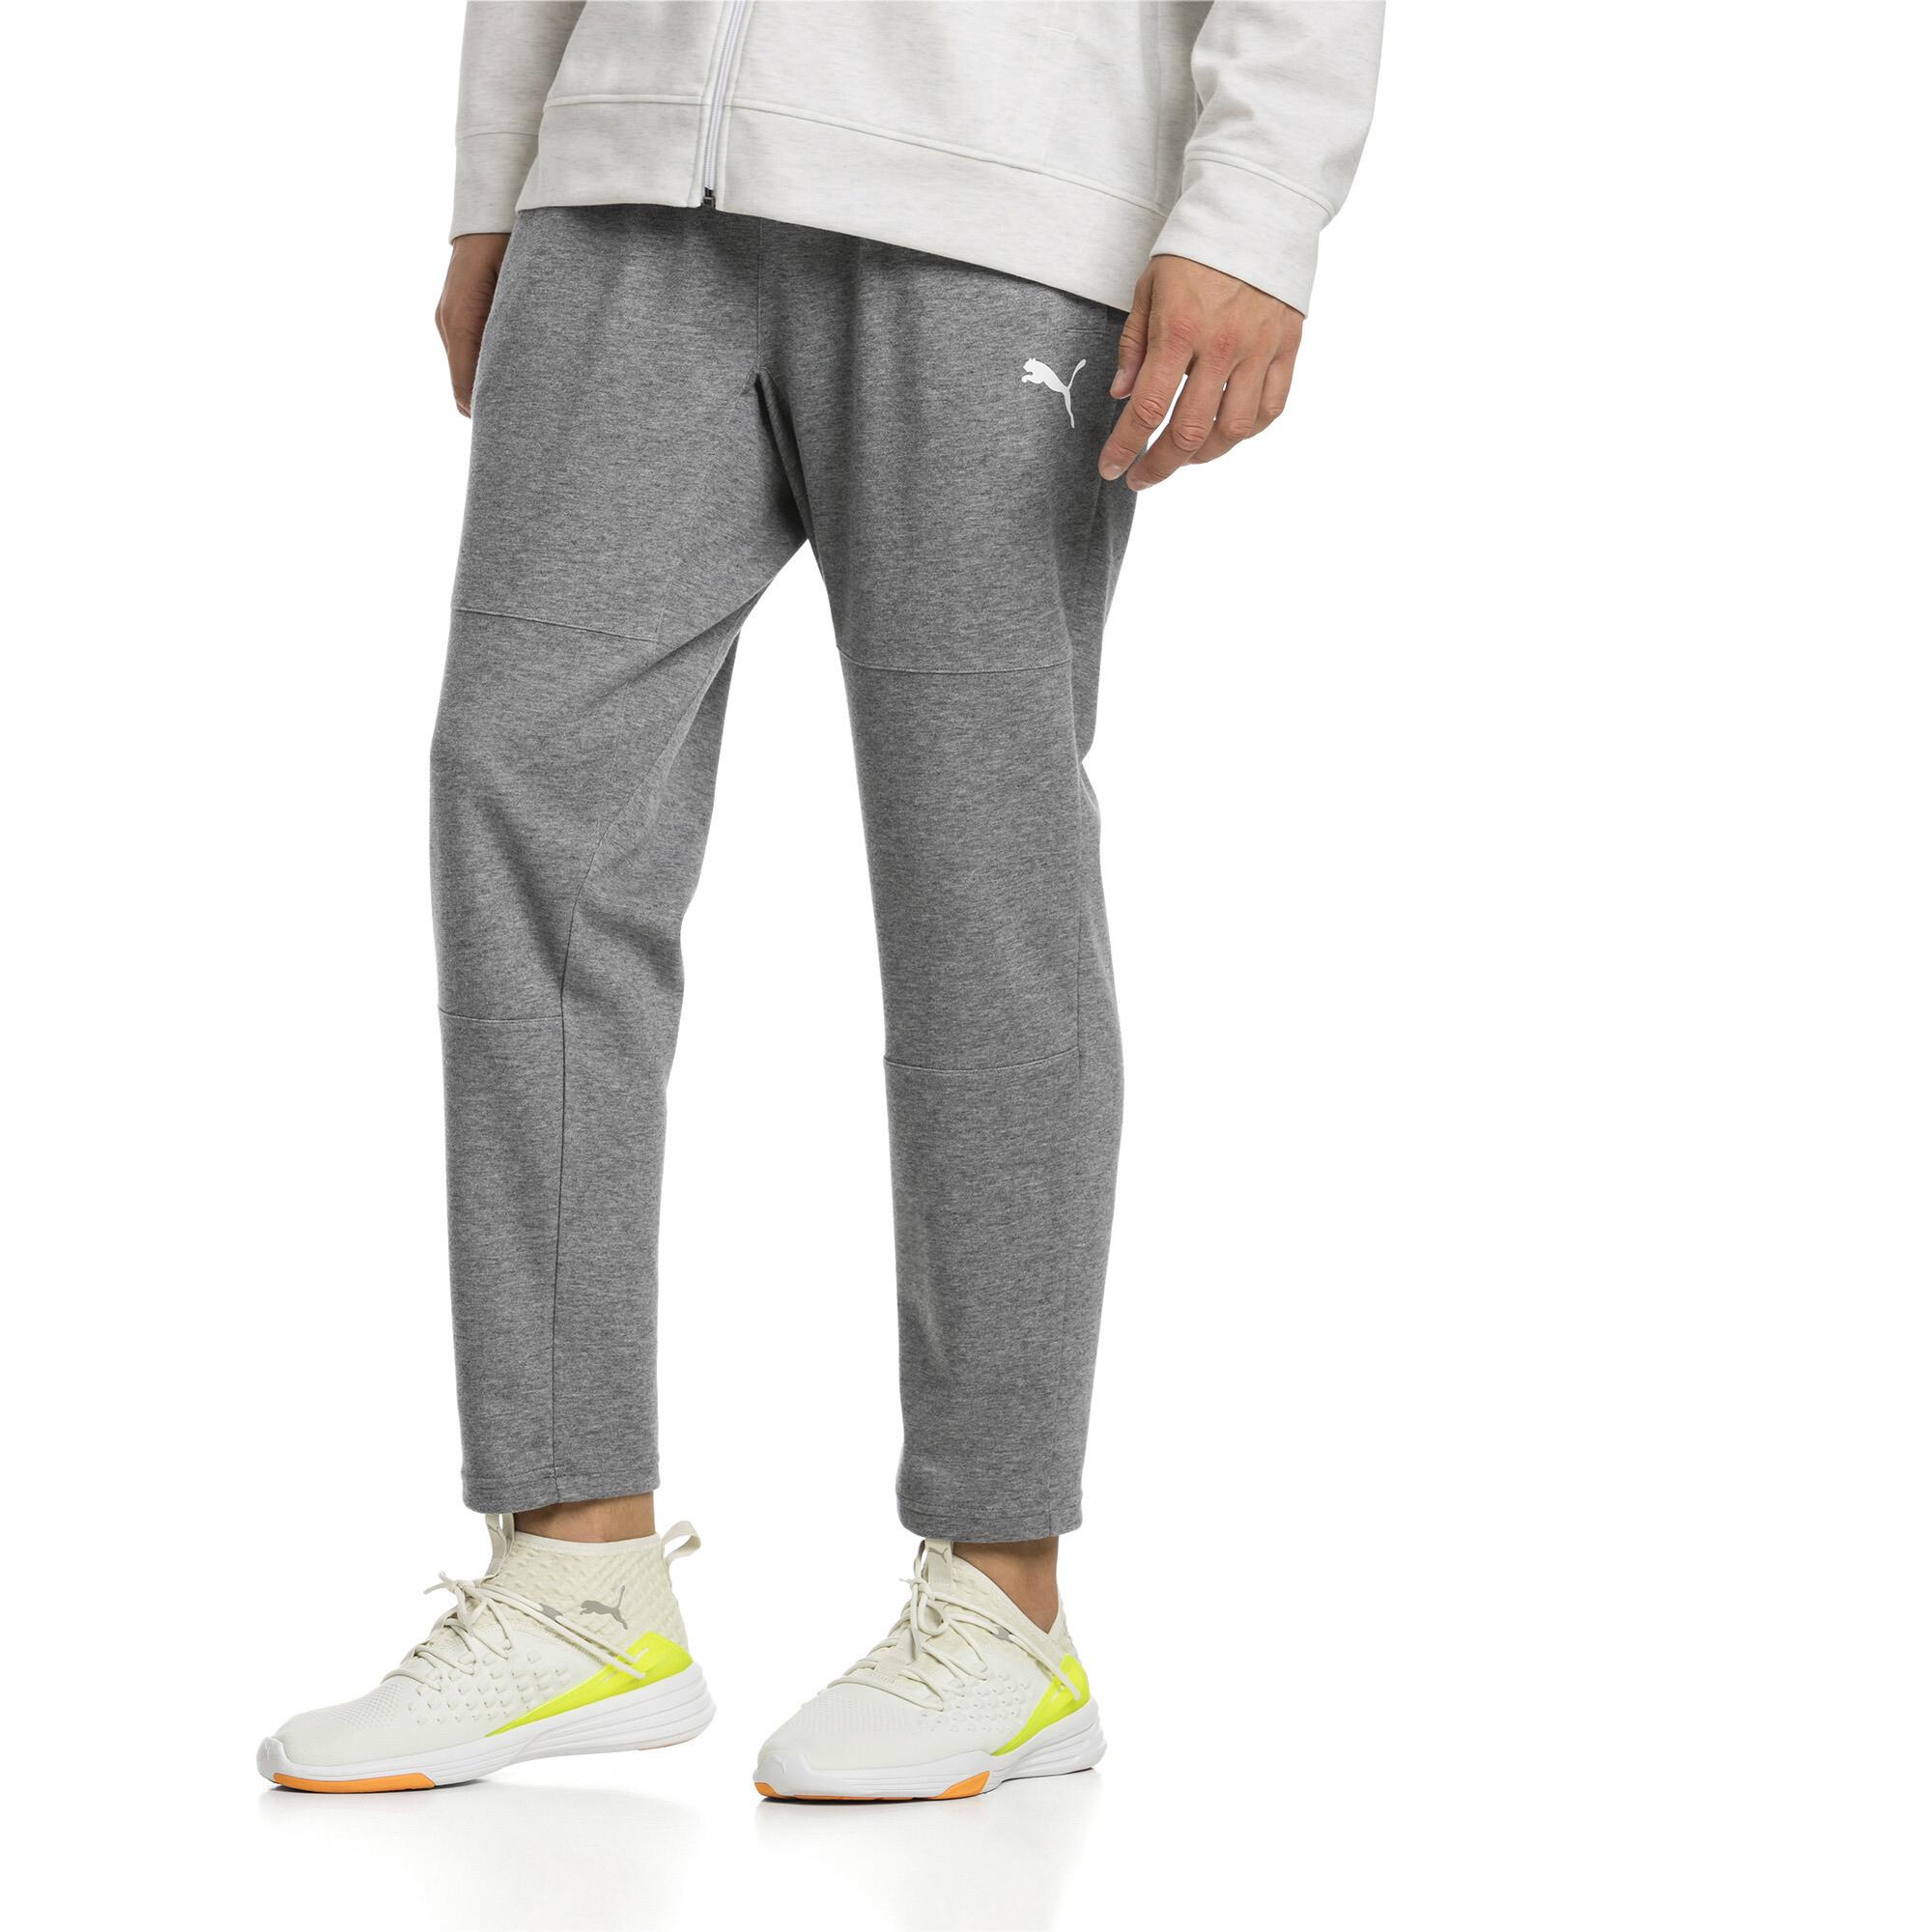 Image Puma Knitted Men's Training Pants #1